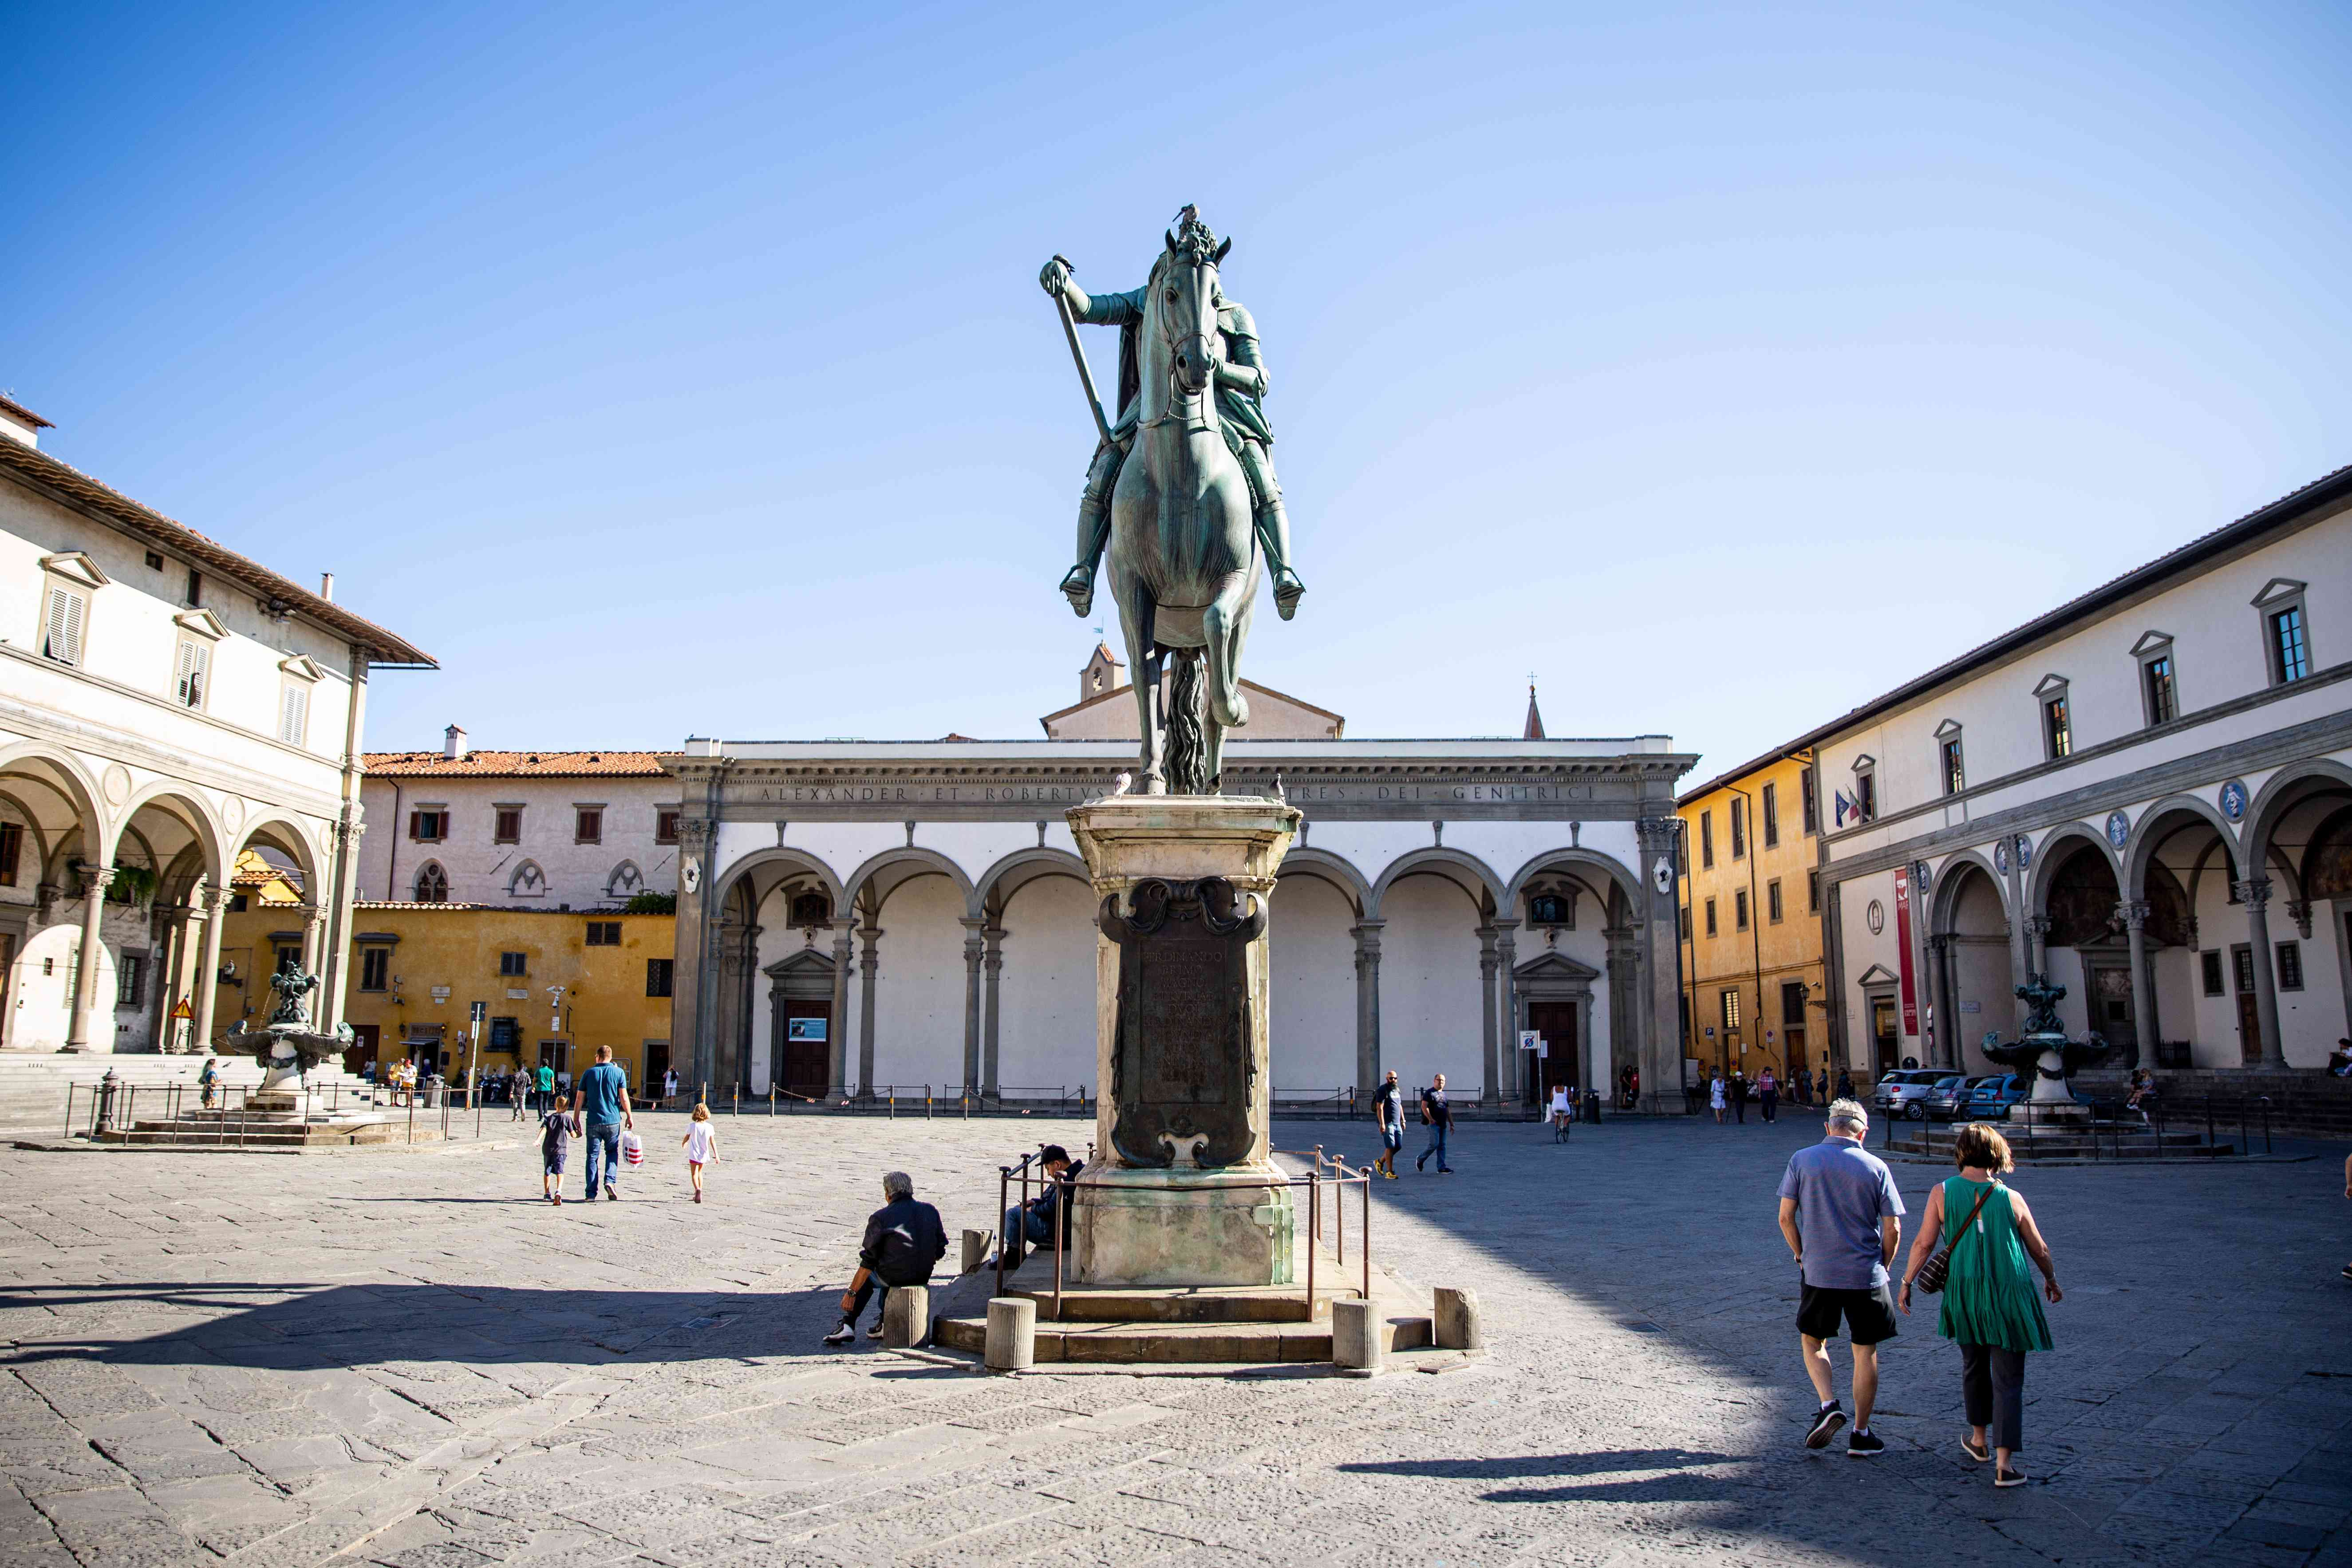 Piazza Santissima Annunziata in Florence, Italy